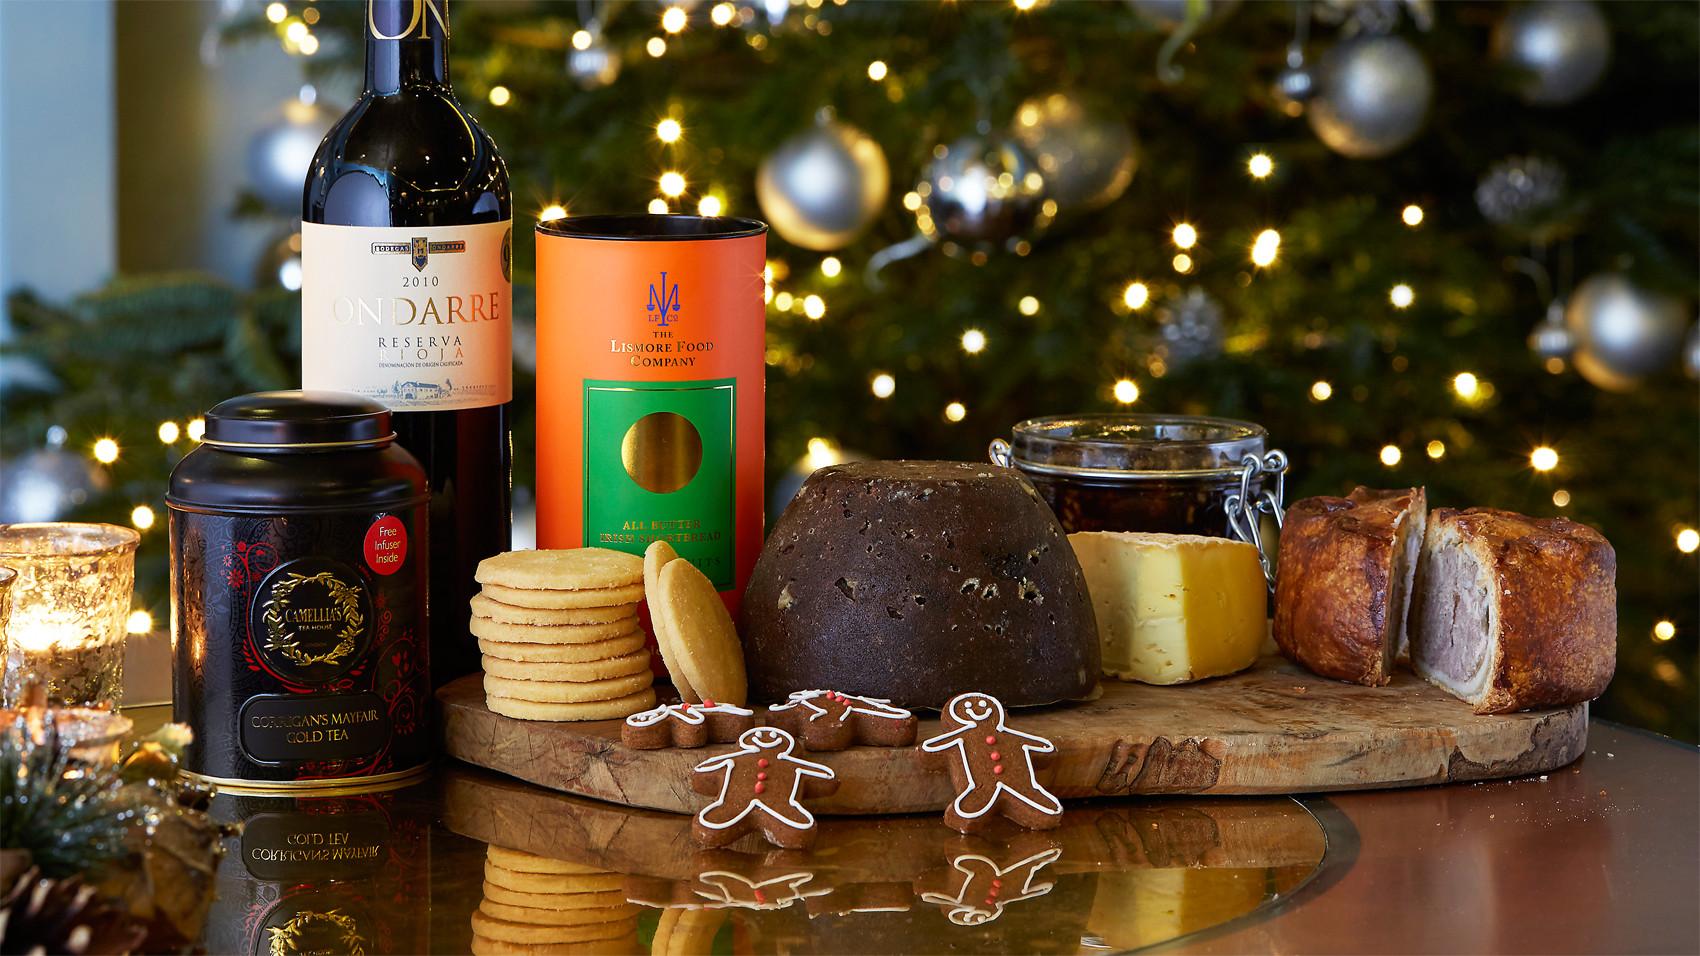 Christmas Food Gifts 2019  Christmas Gift Guide 2017 Luxury Food & Drink